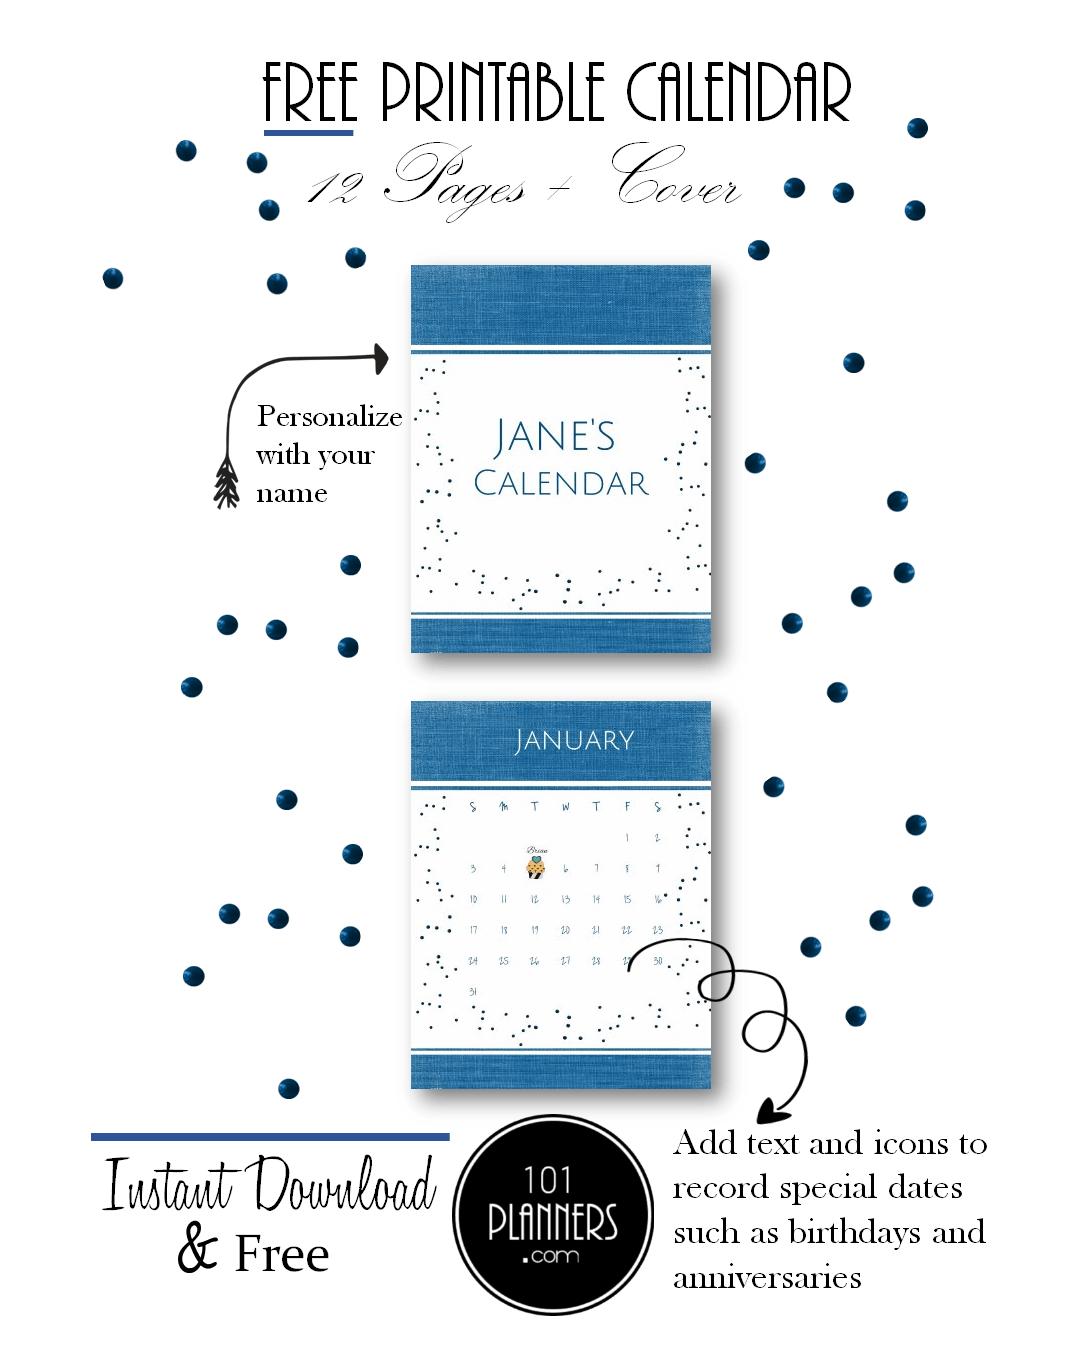 Free Printable March 2021 Calendar | Customize Online Pertaining To Mexican Calendar Saint Names 2021